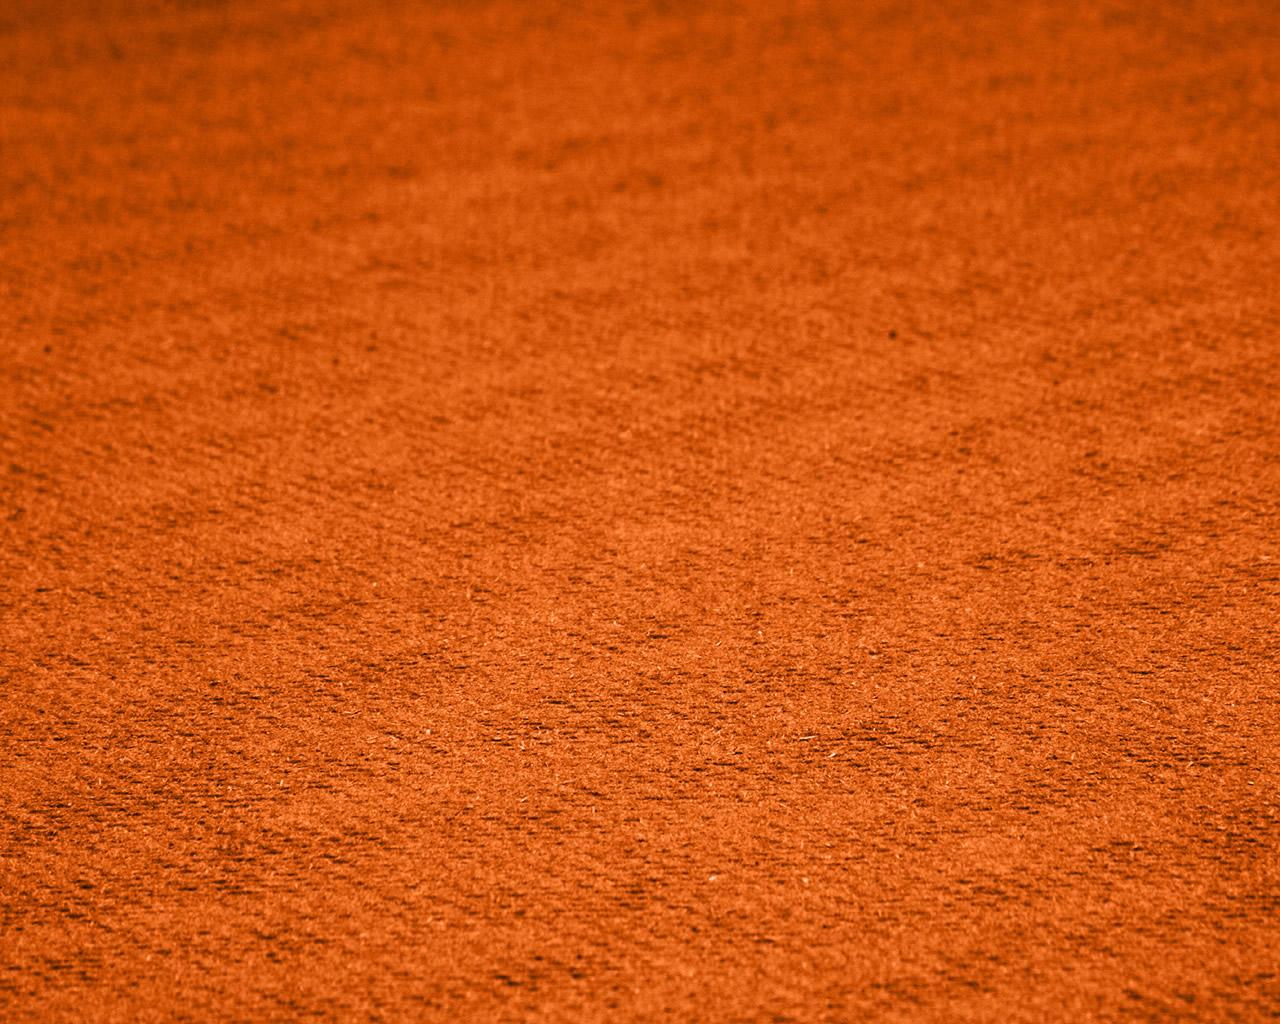 fabric desktop wallpaper - photo #17